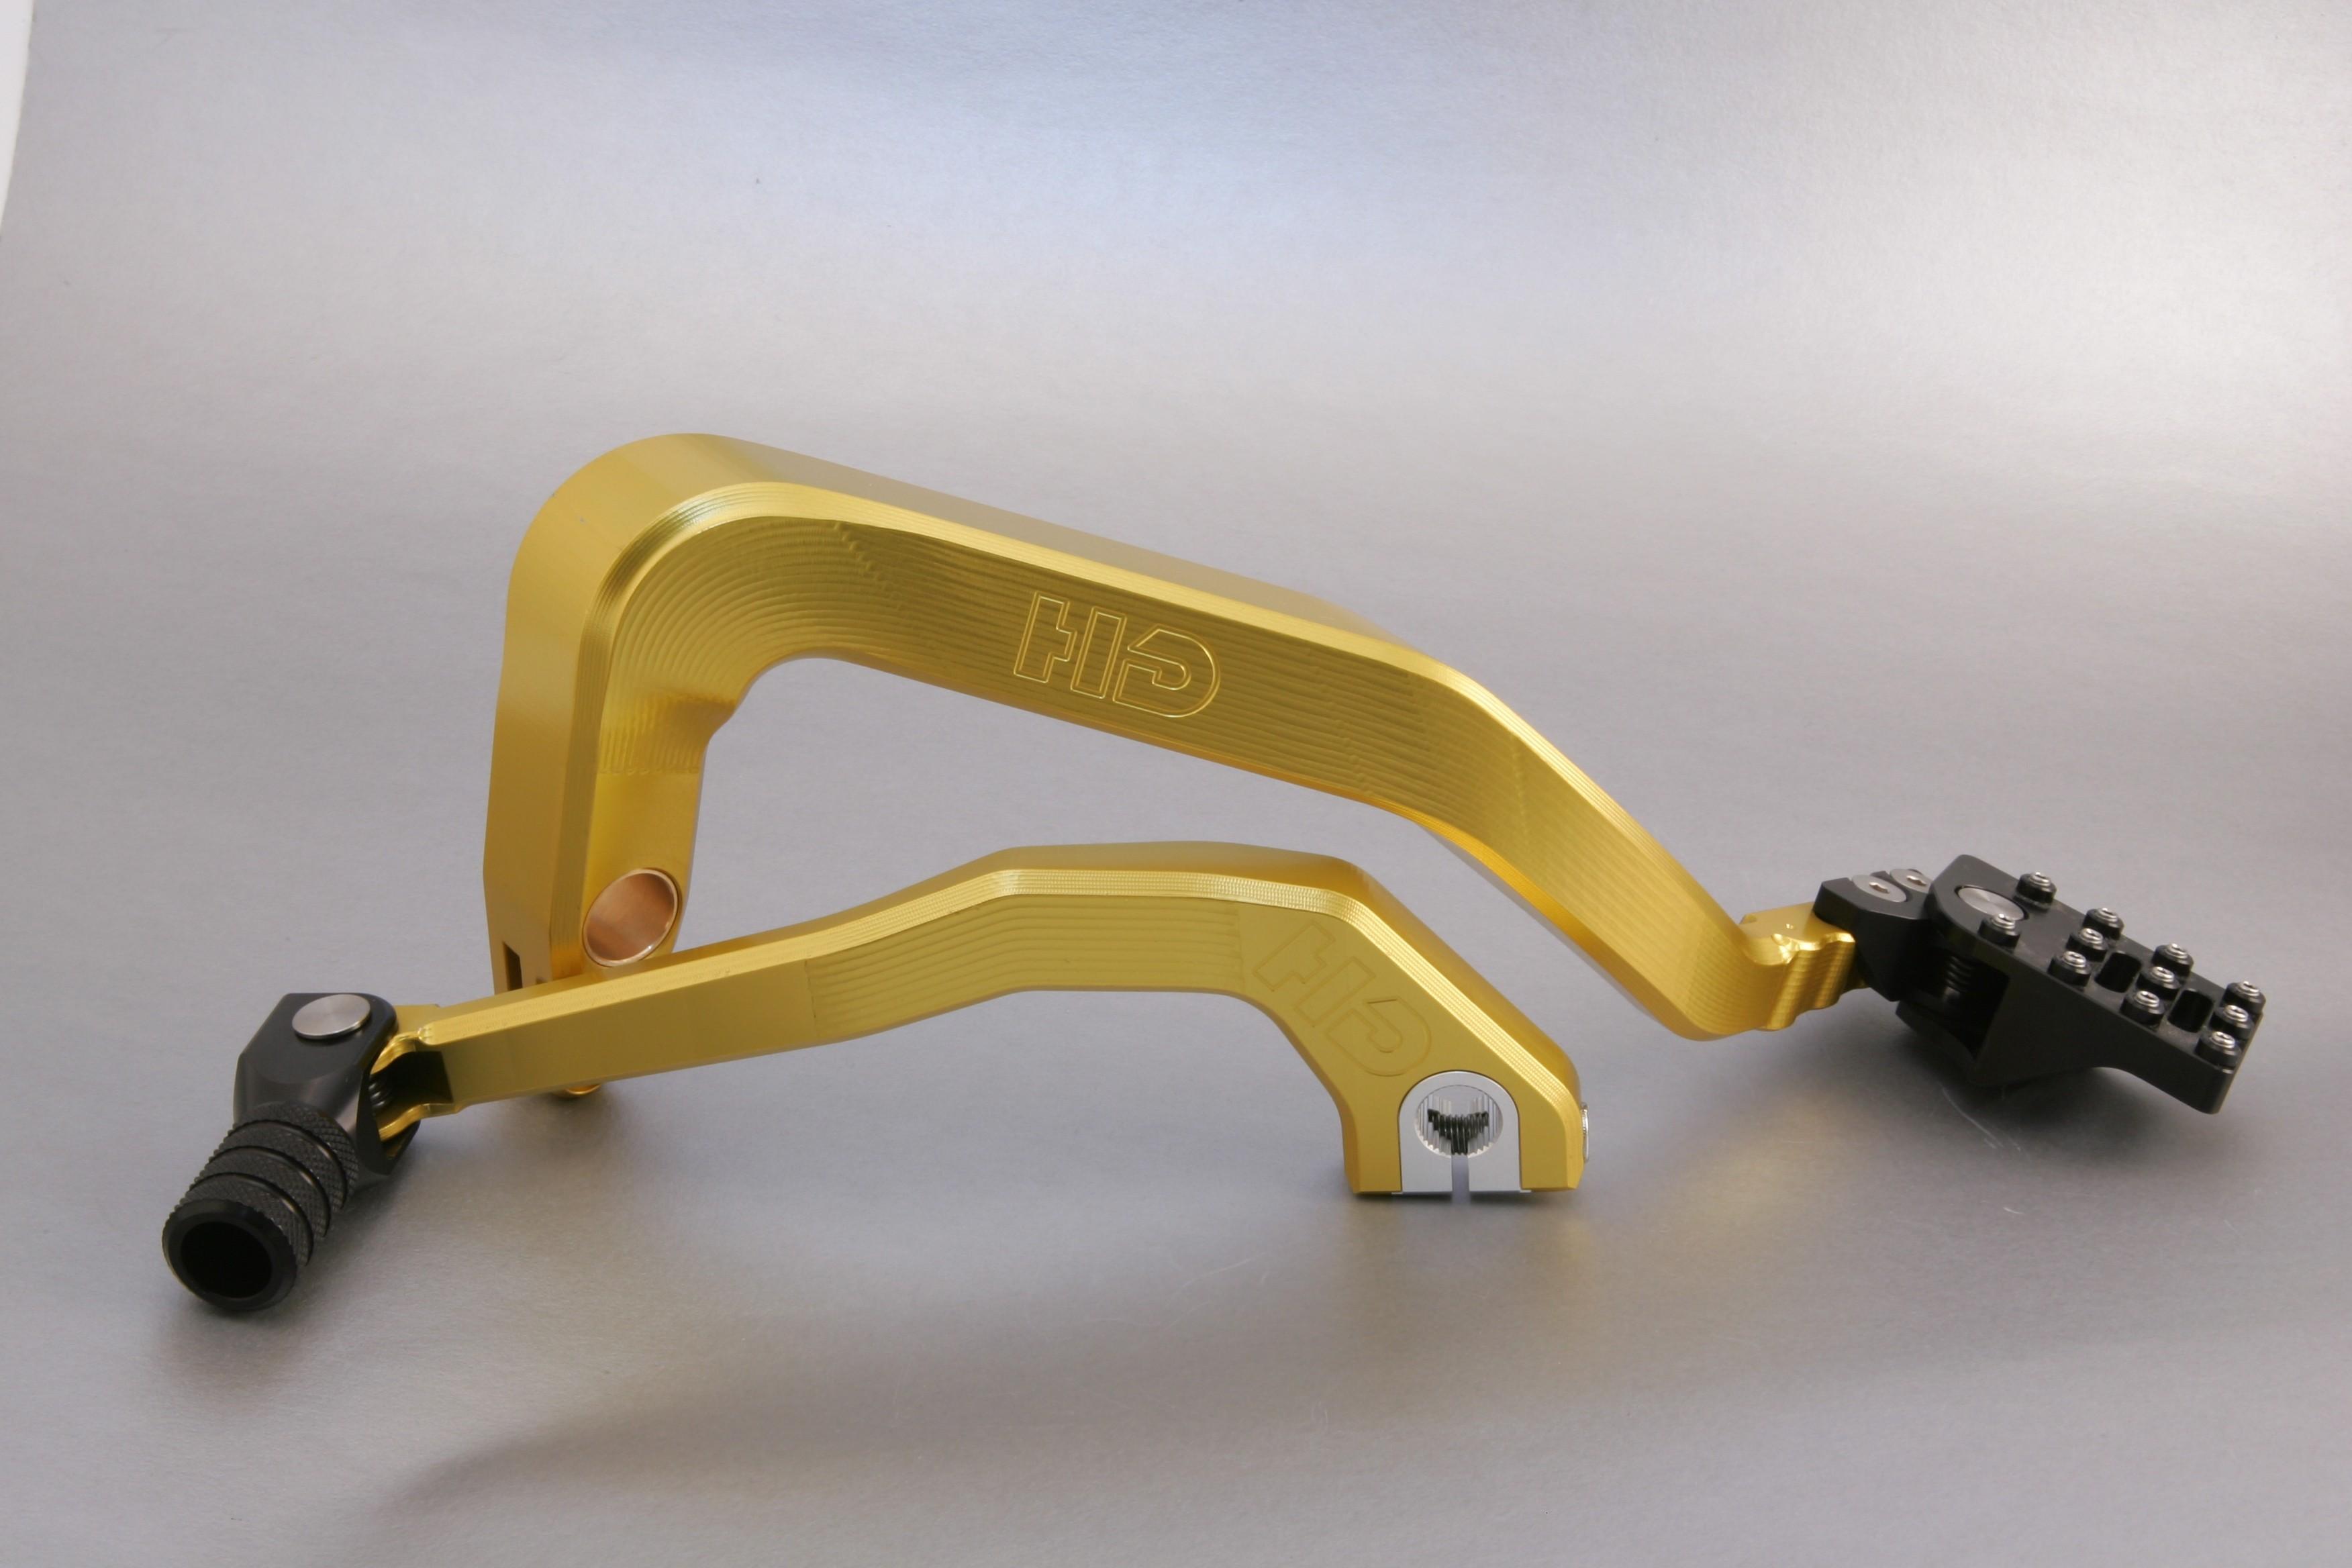 Harley Davidson GOLD Dyna Combo Kit with Titanium Pivot Pins